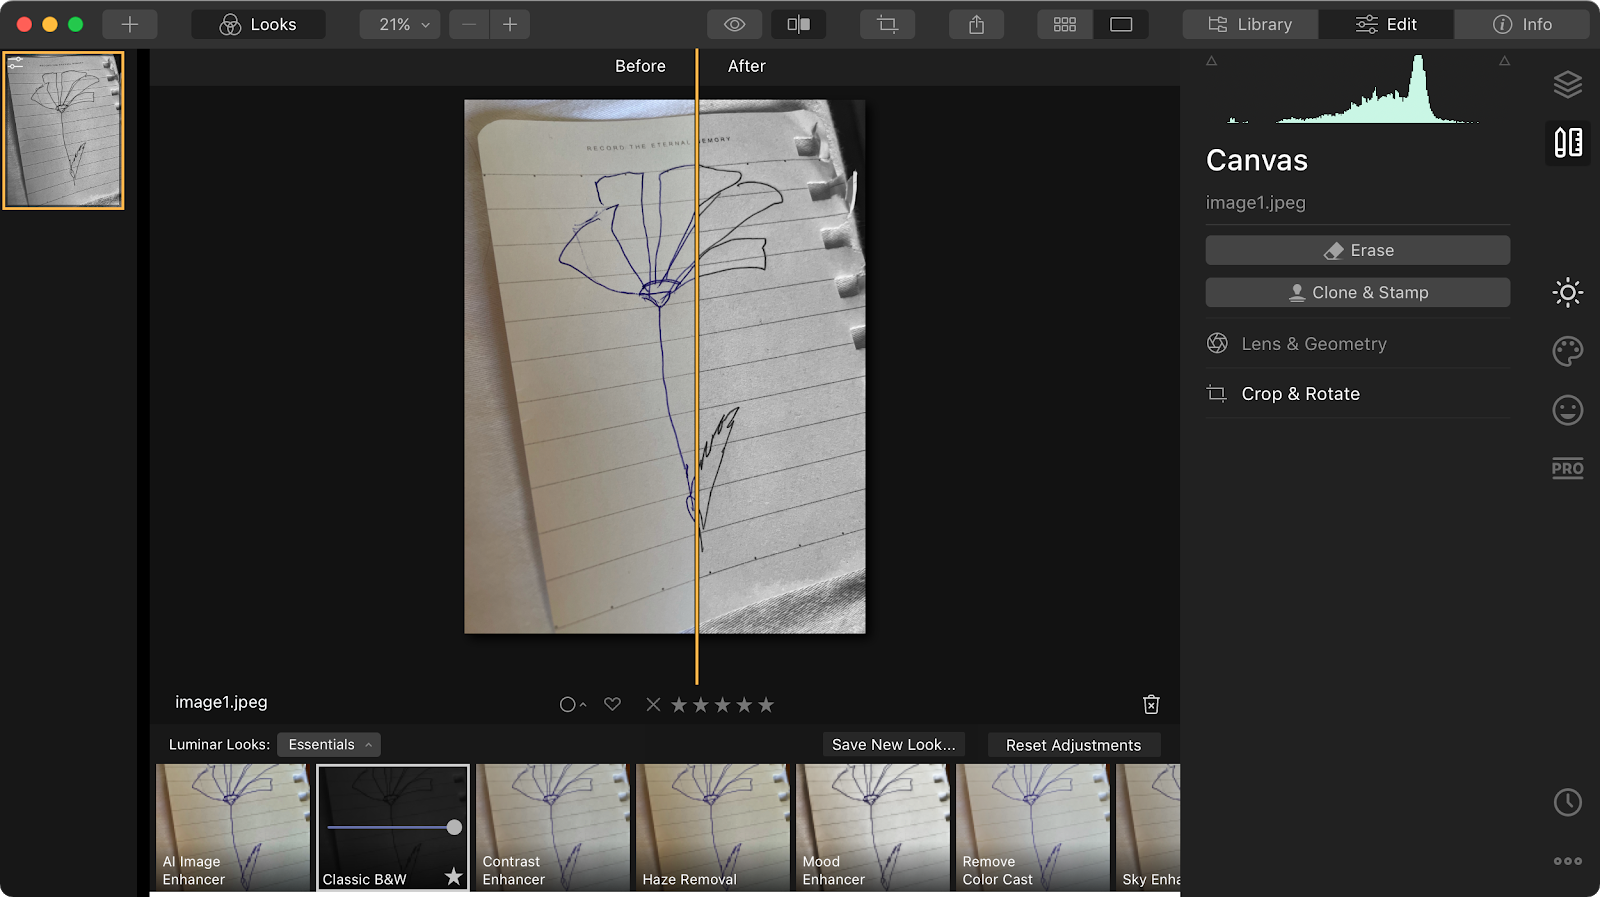 photo editing with Luminar